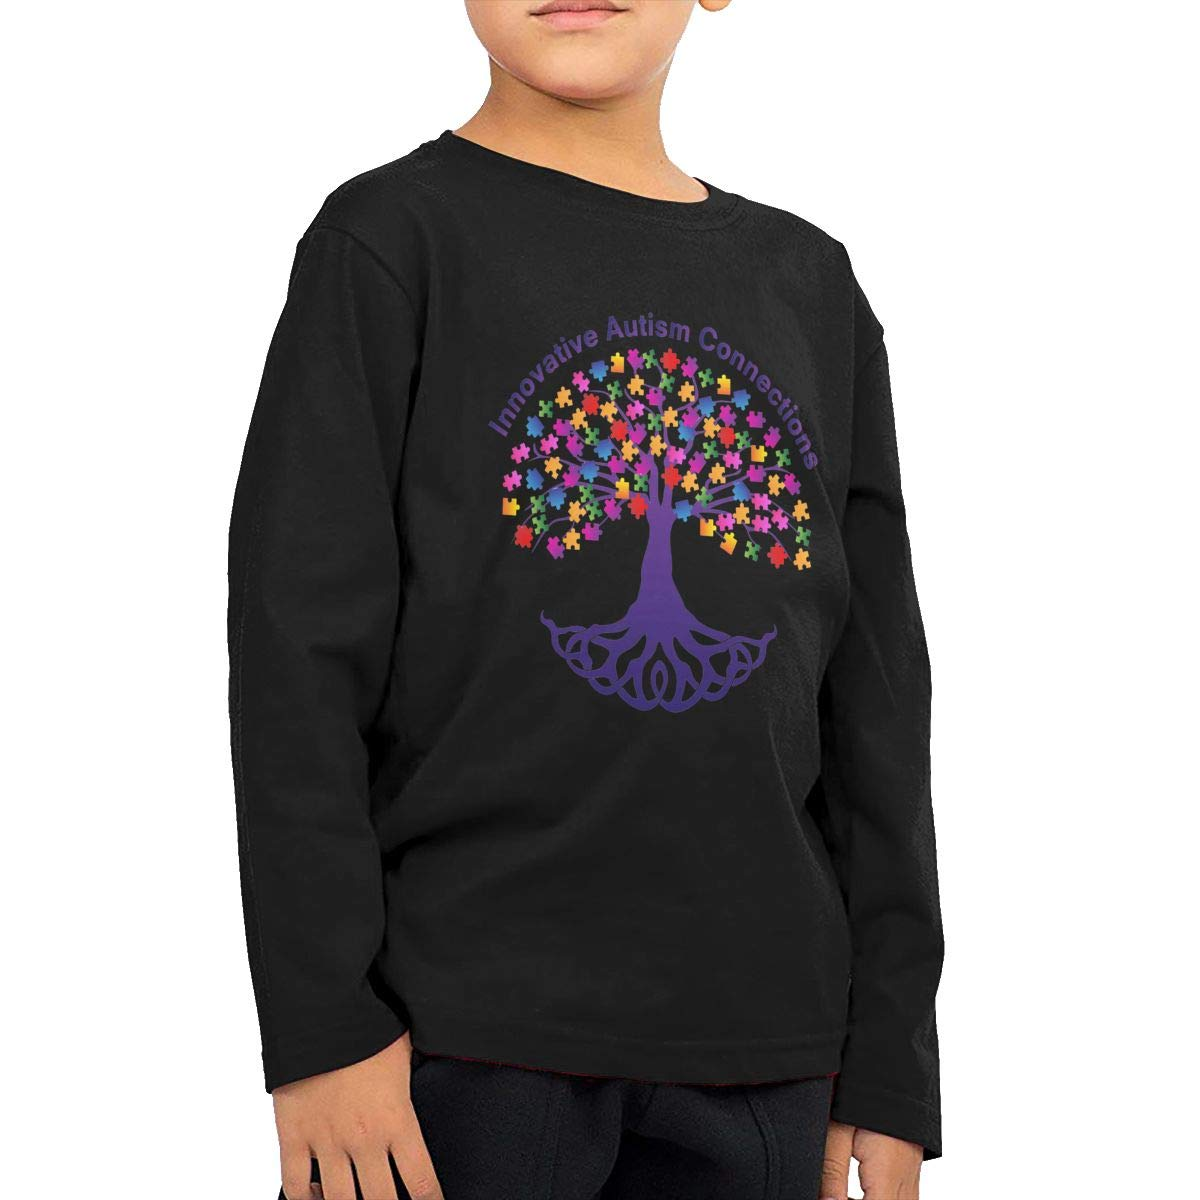 Autism Tree Art Fashion Toddler Kid Baby Boys Girls Long Sleeve T Shirts Clothing